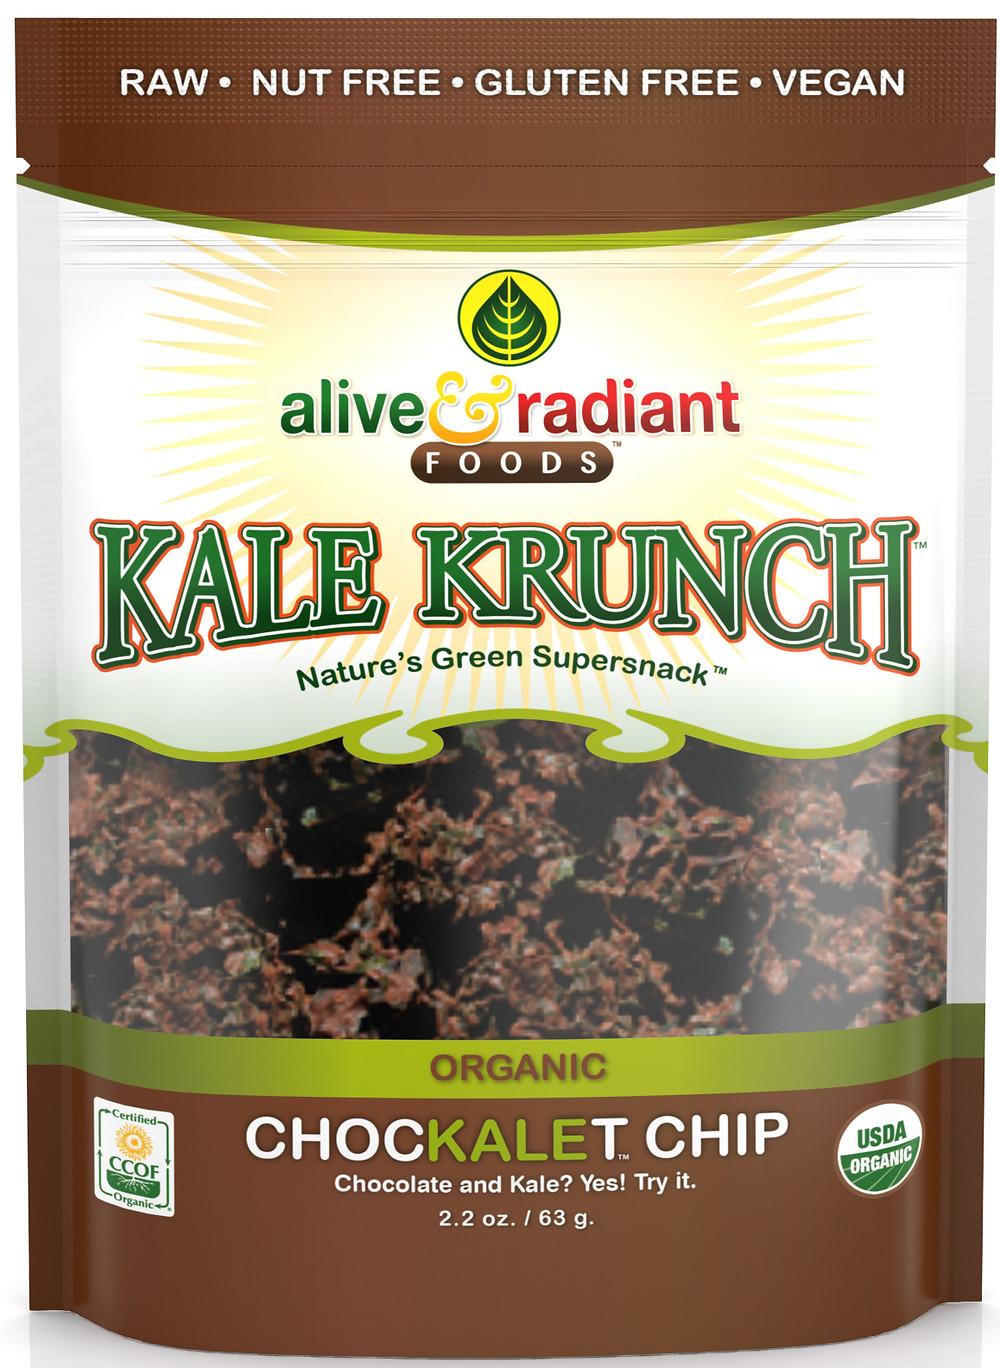 Chocolate Chip Kale Krunch